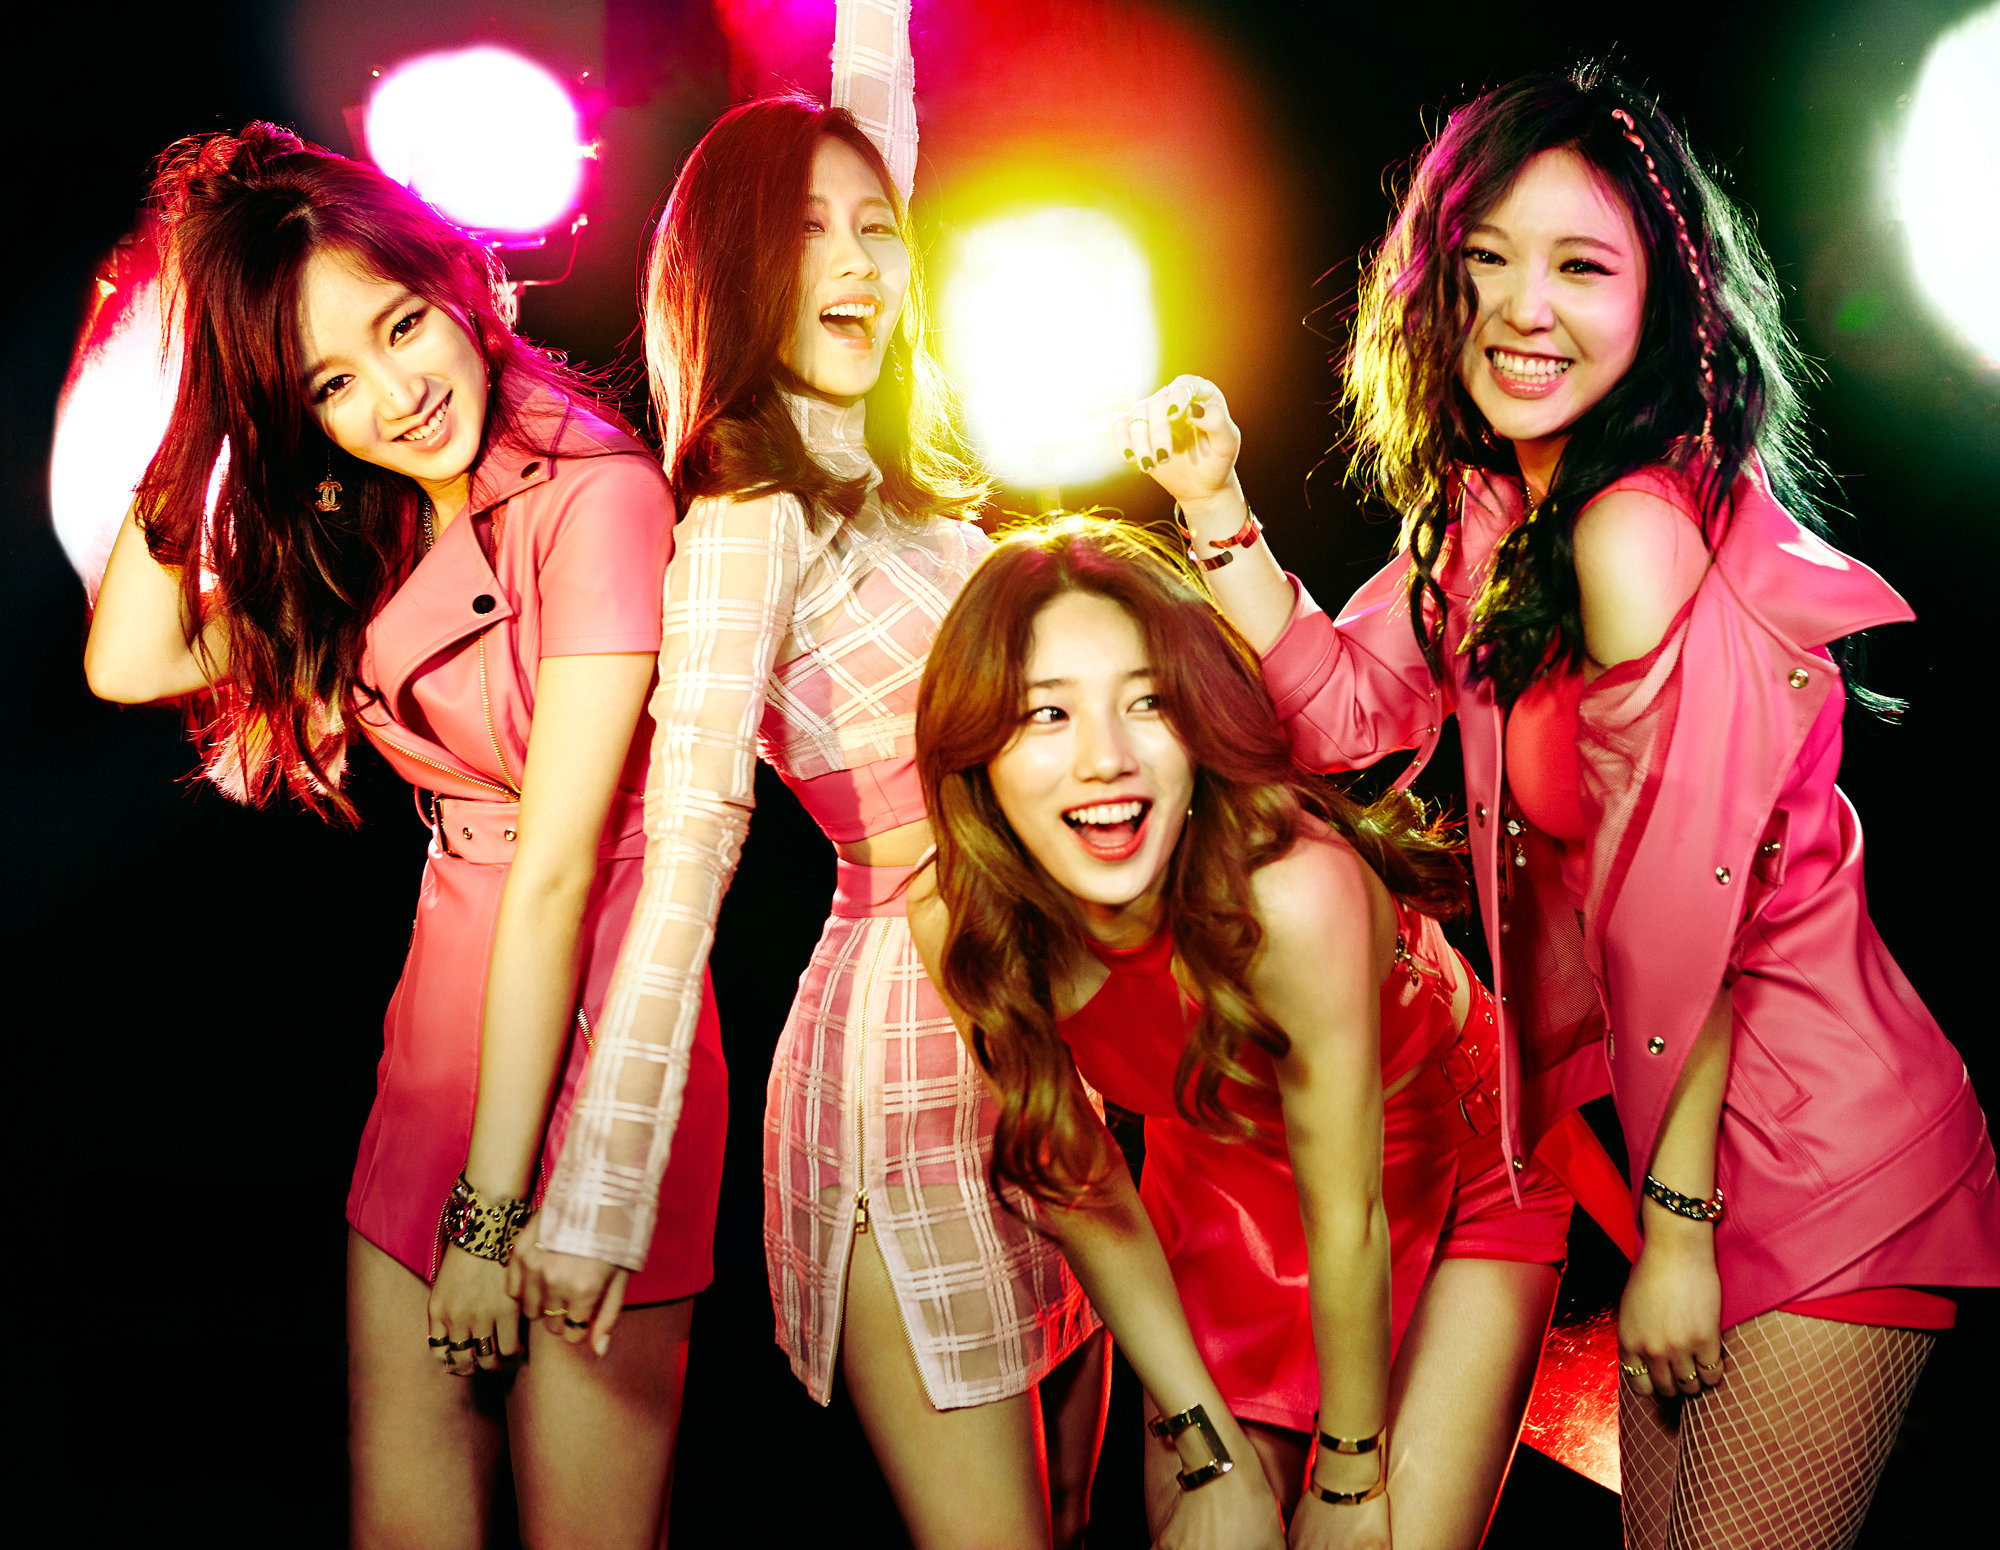 http://korean-cute.sosugary.com/albums/userpics/10001/ibvl8j6SRp2yGE.jpg